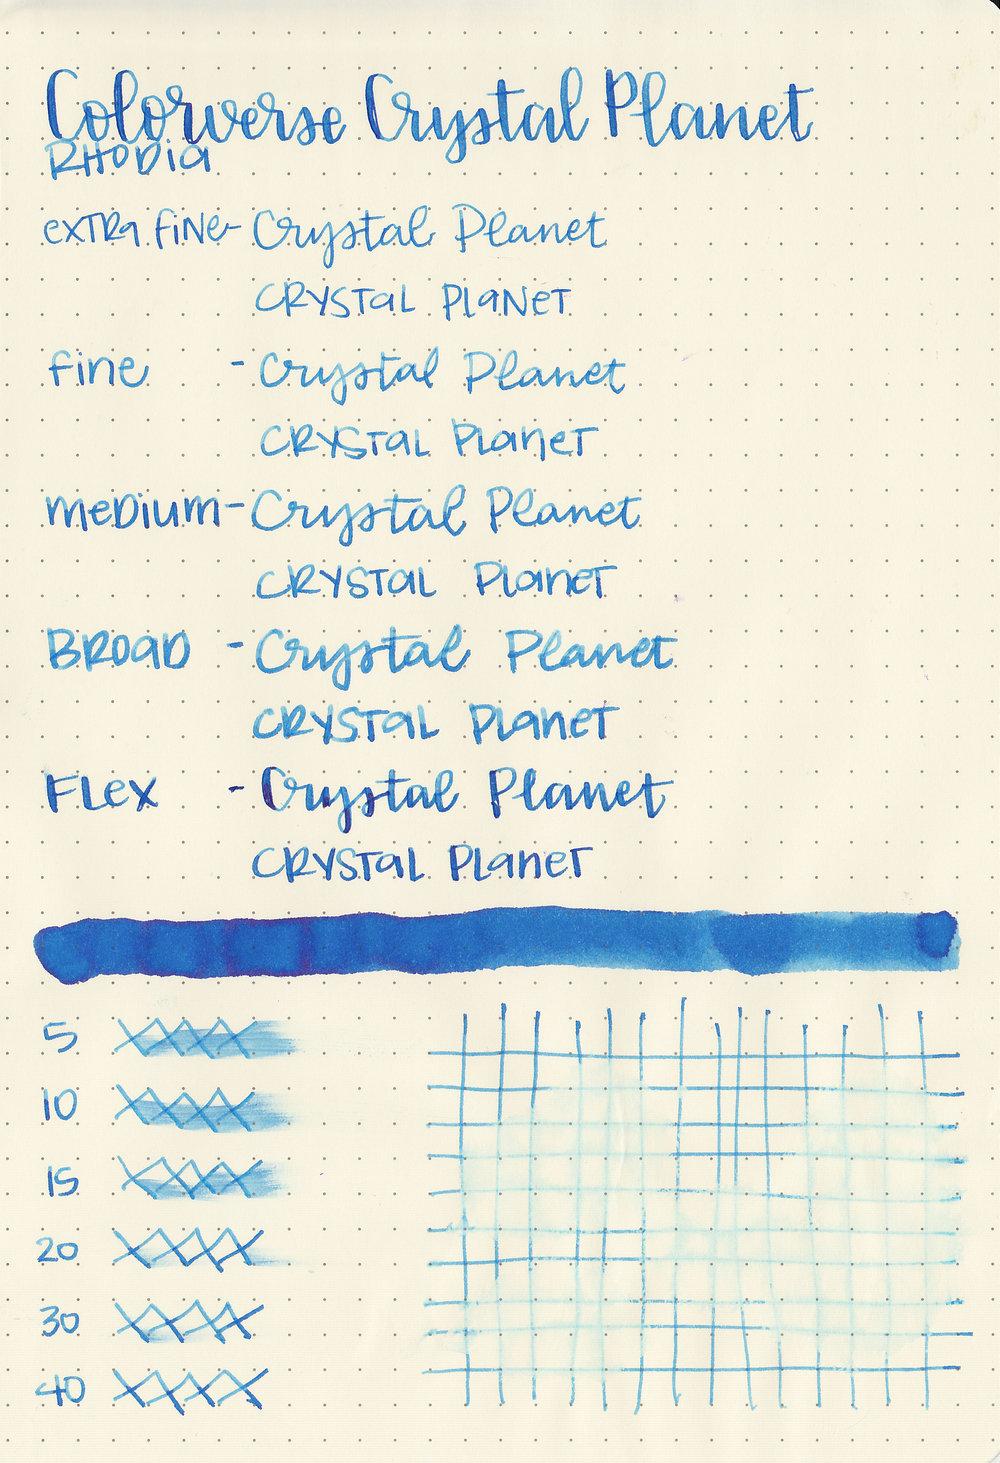 cv-crystal-planet-5.jpg